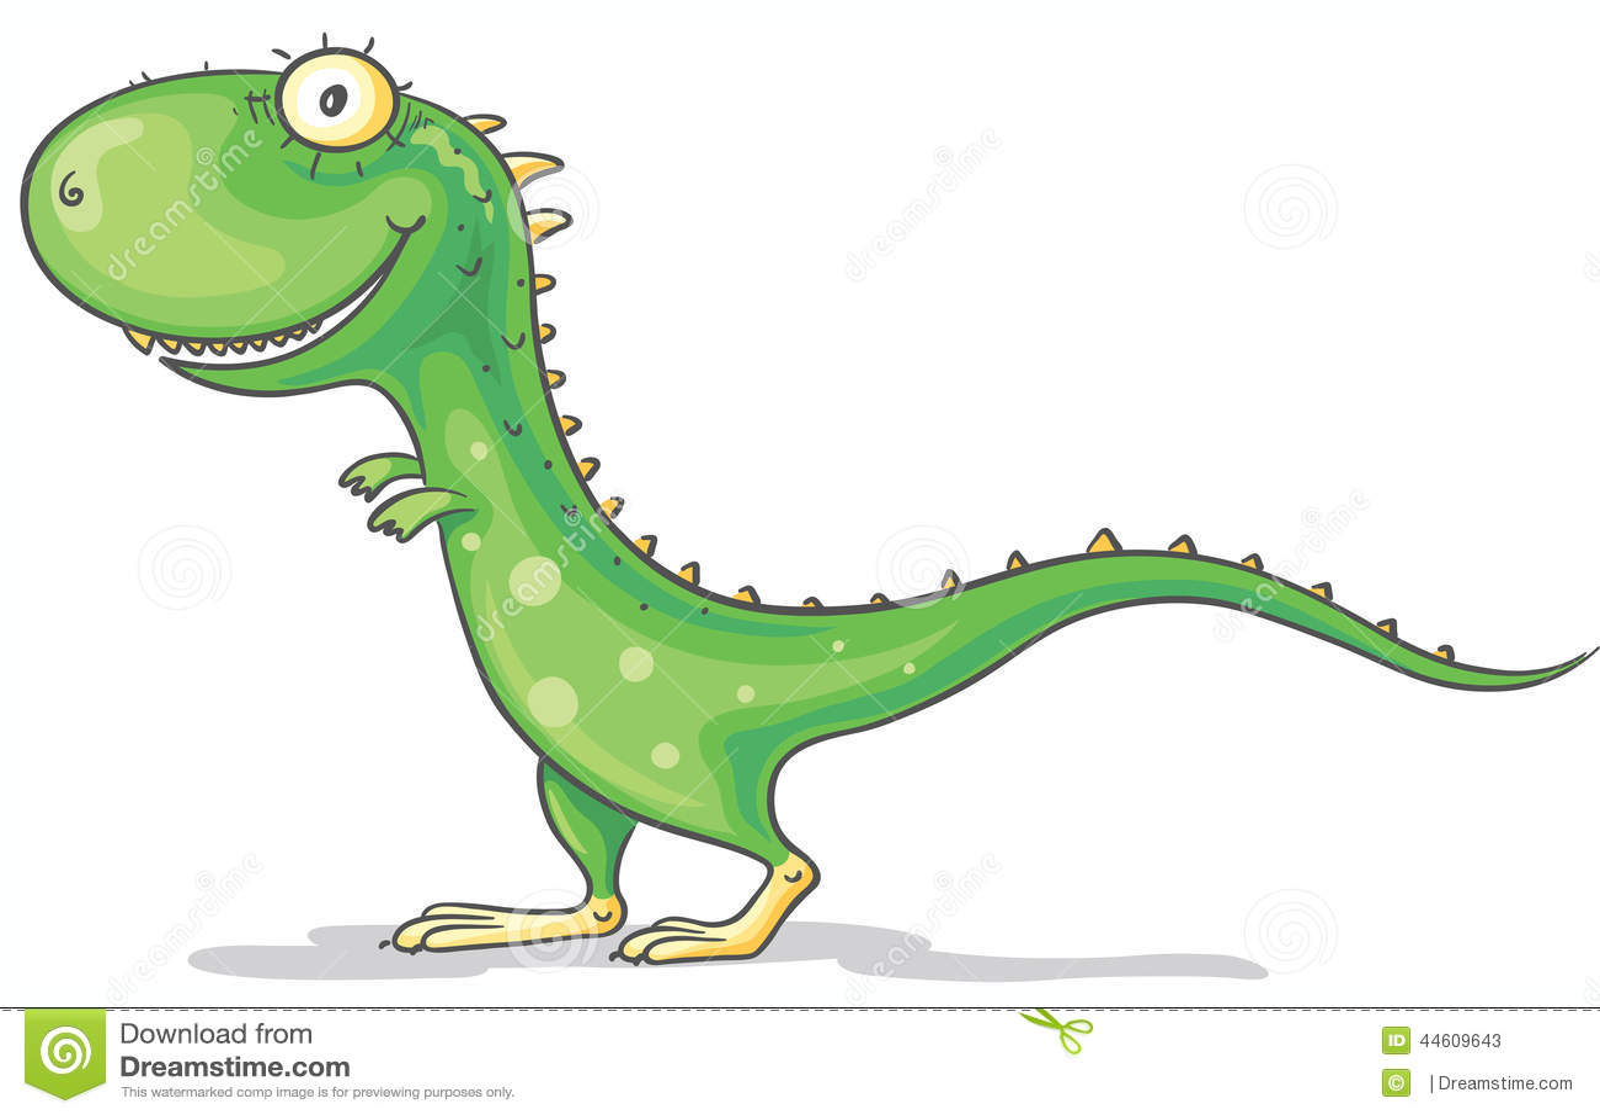 Cartoon Green Dinosaur Stock Vector - Image: 44609643